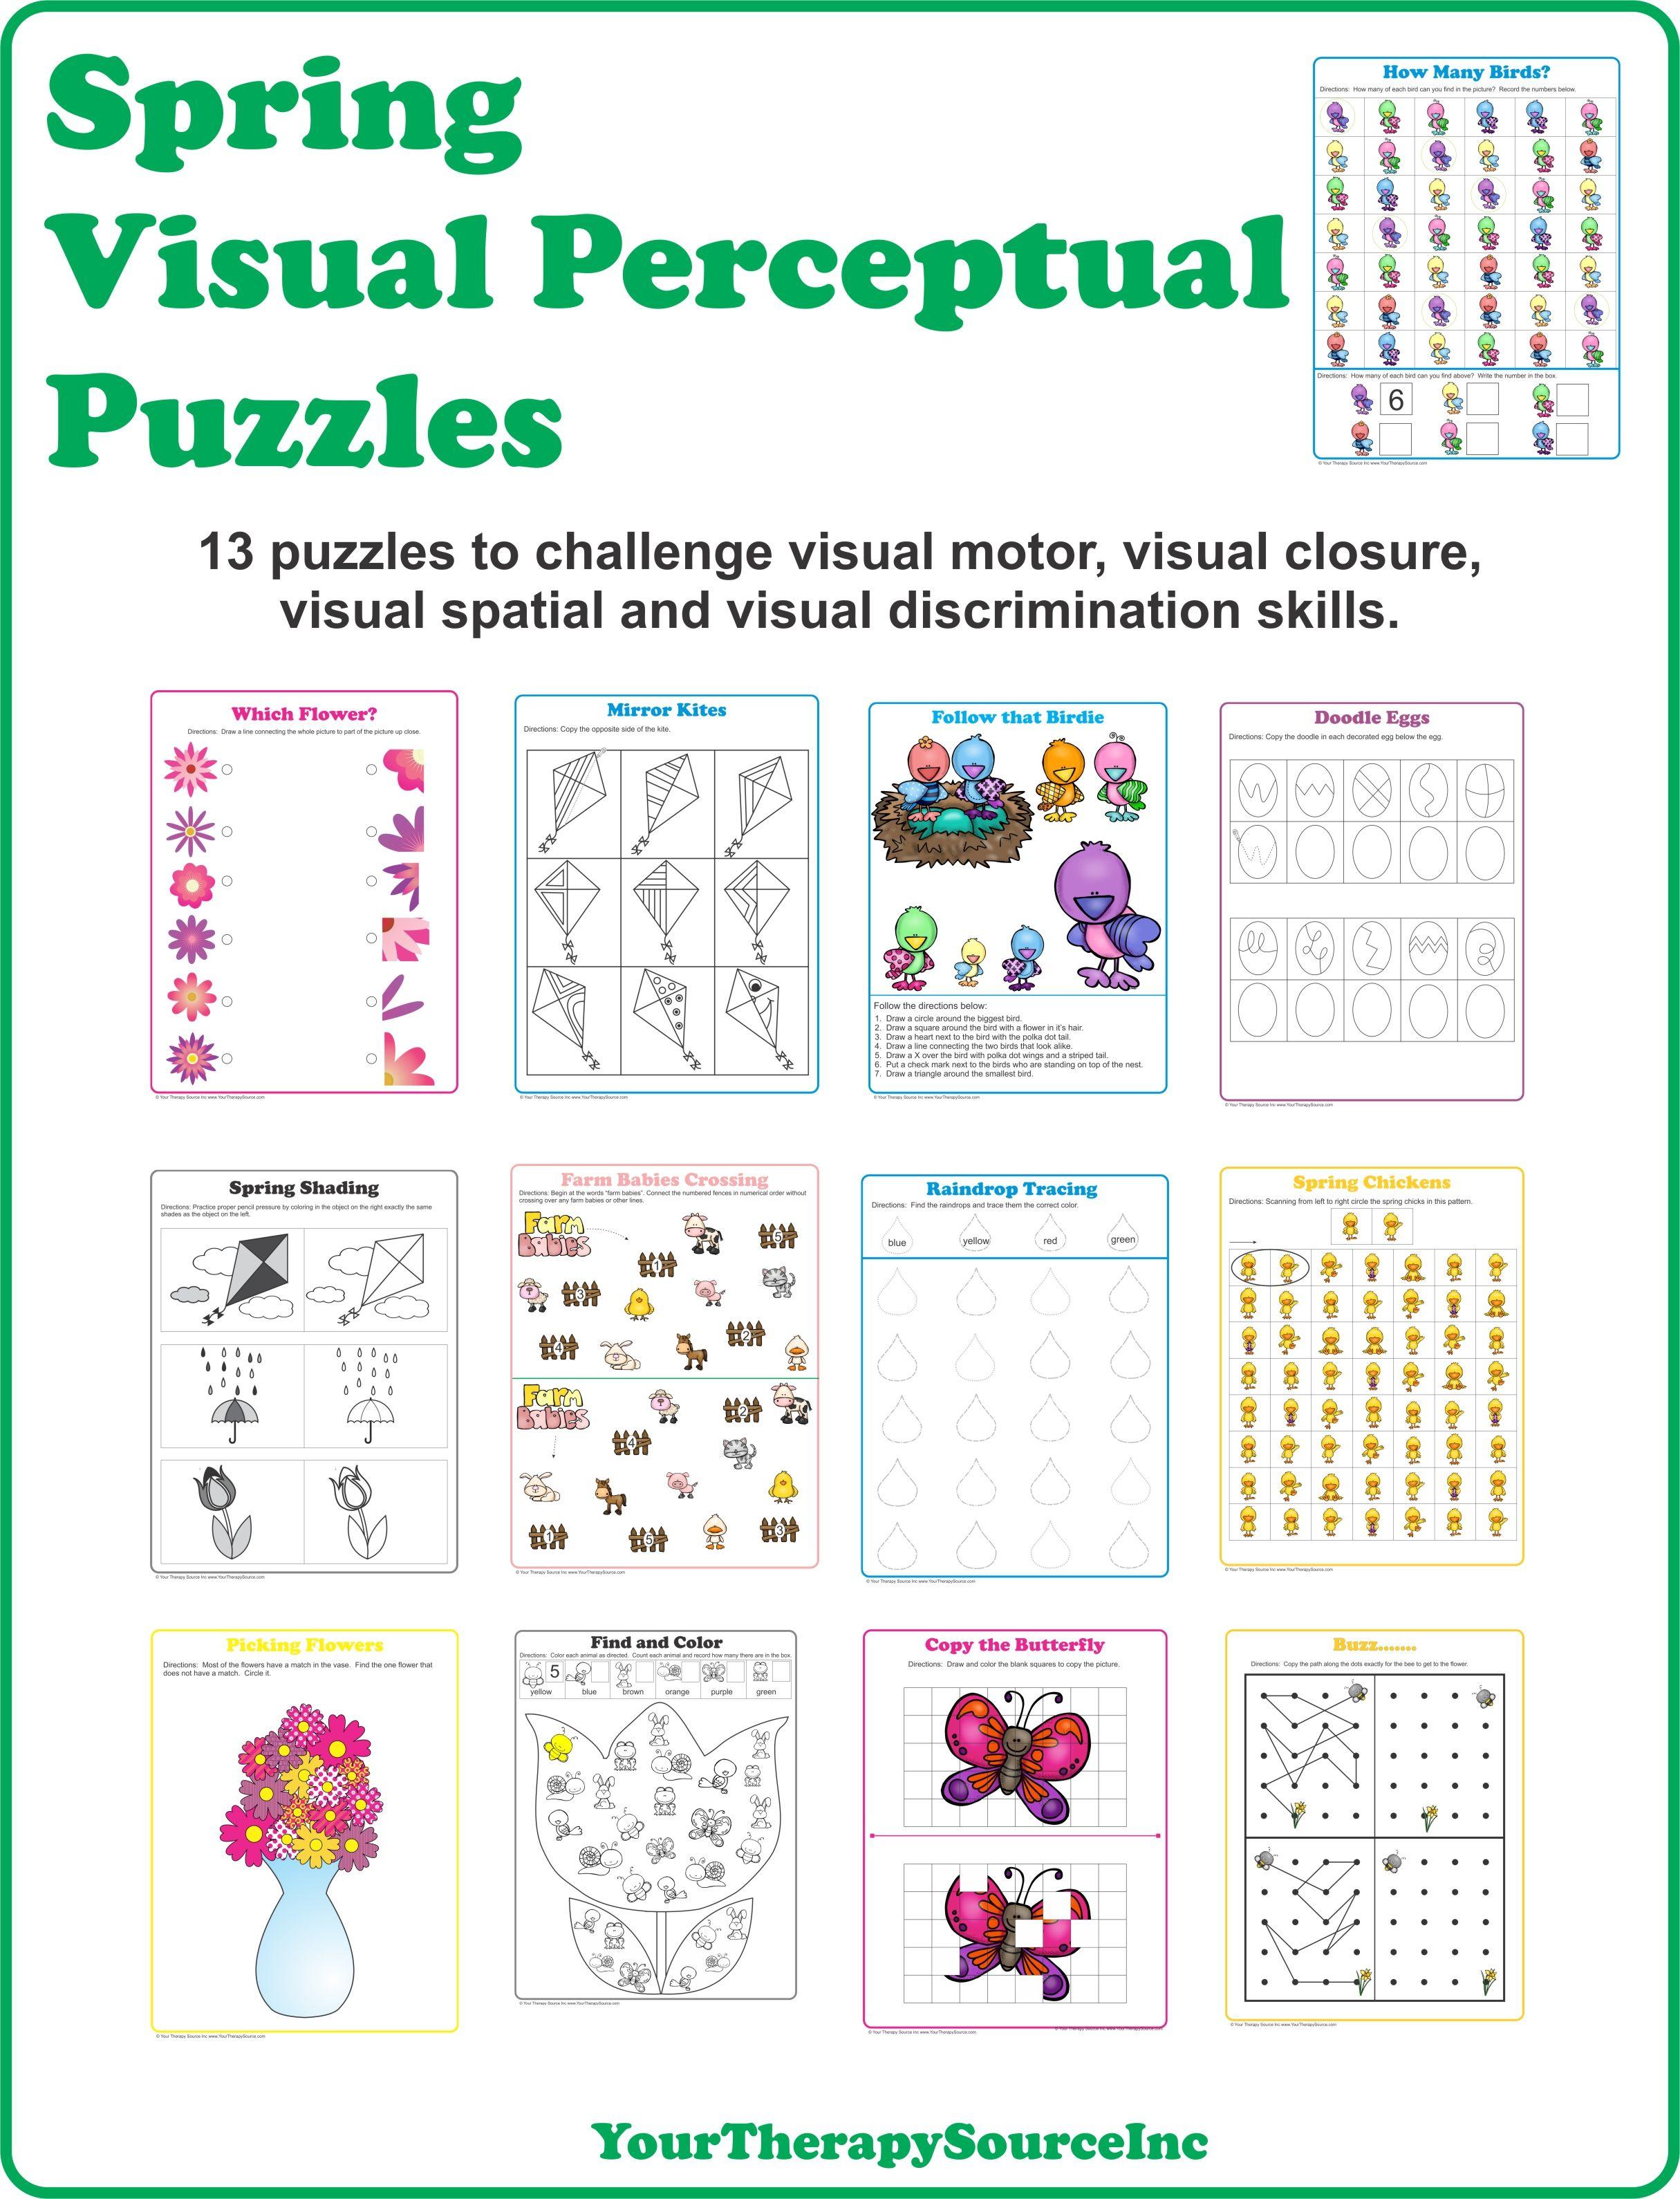 Printable Spring Puzzles Printable Crossword Puzzles Kids Worksheets Printables Visual Discrimination English Worksheets For Kids